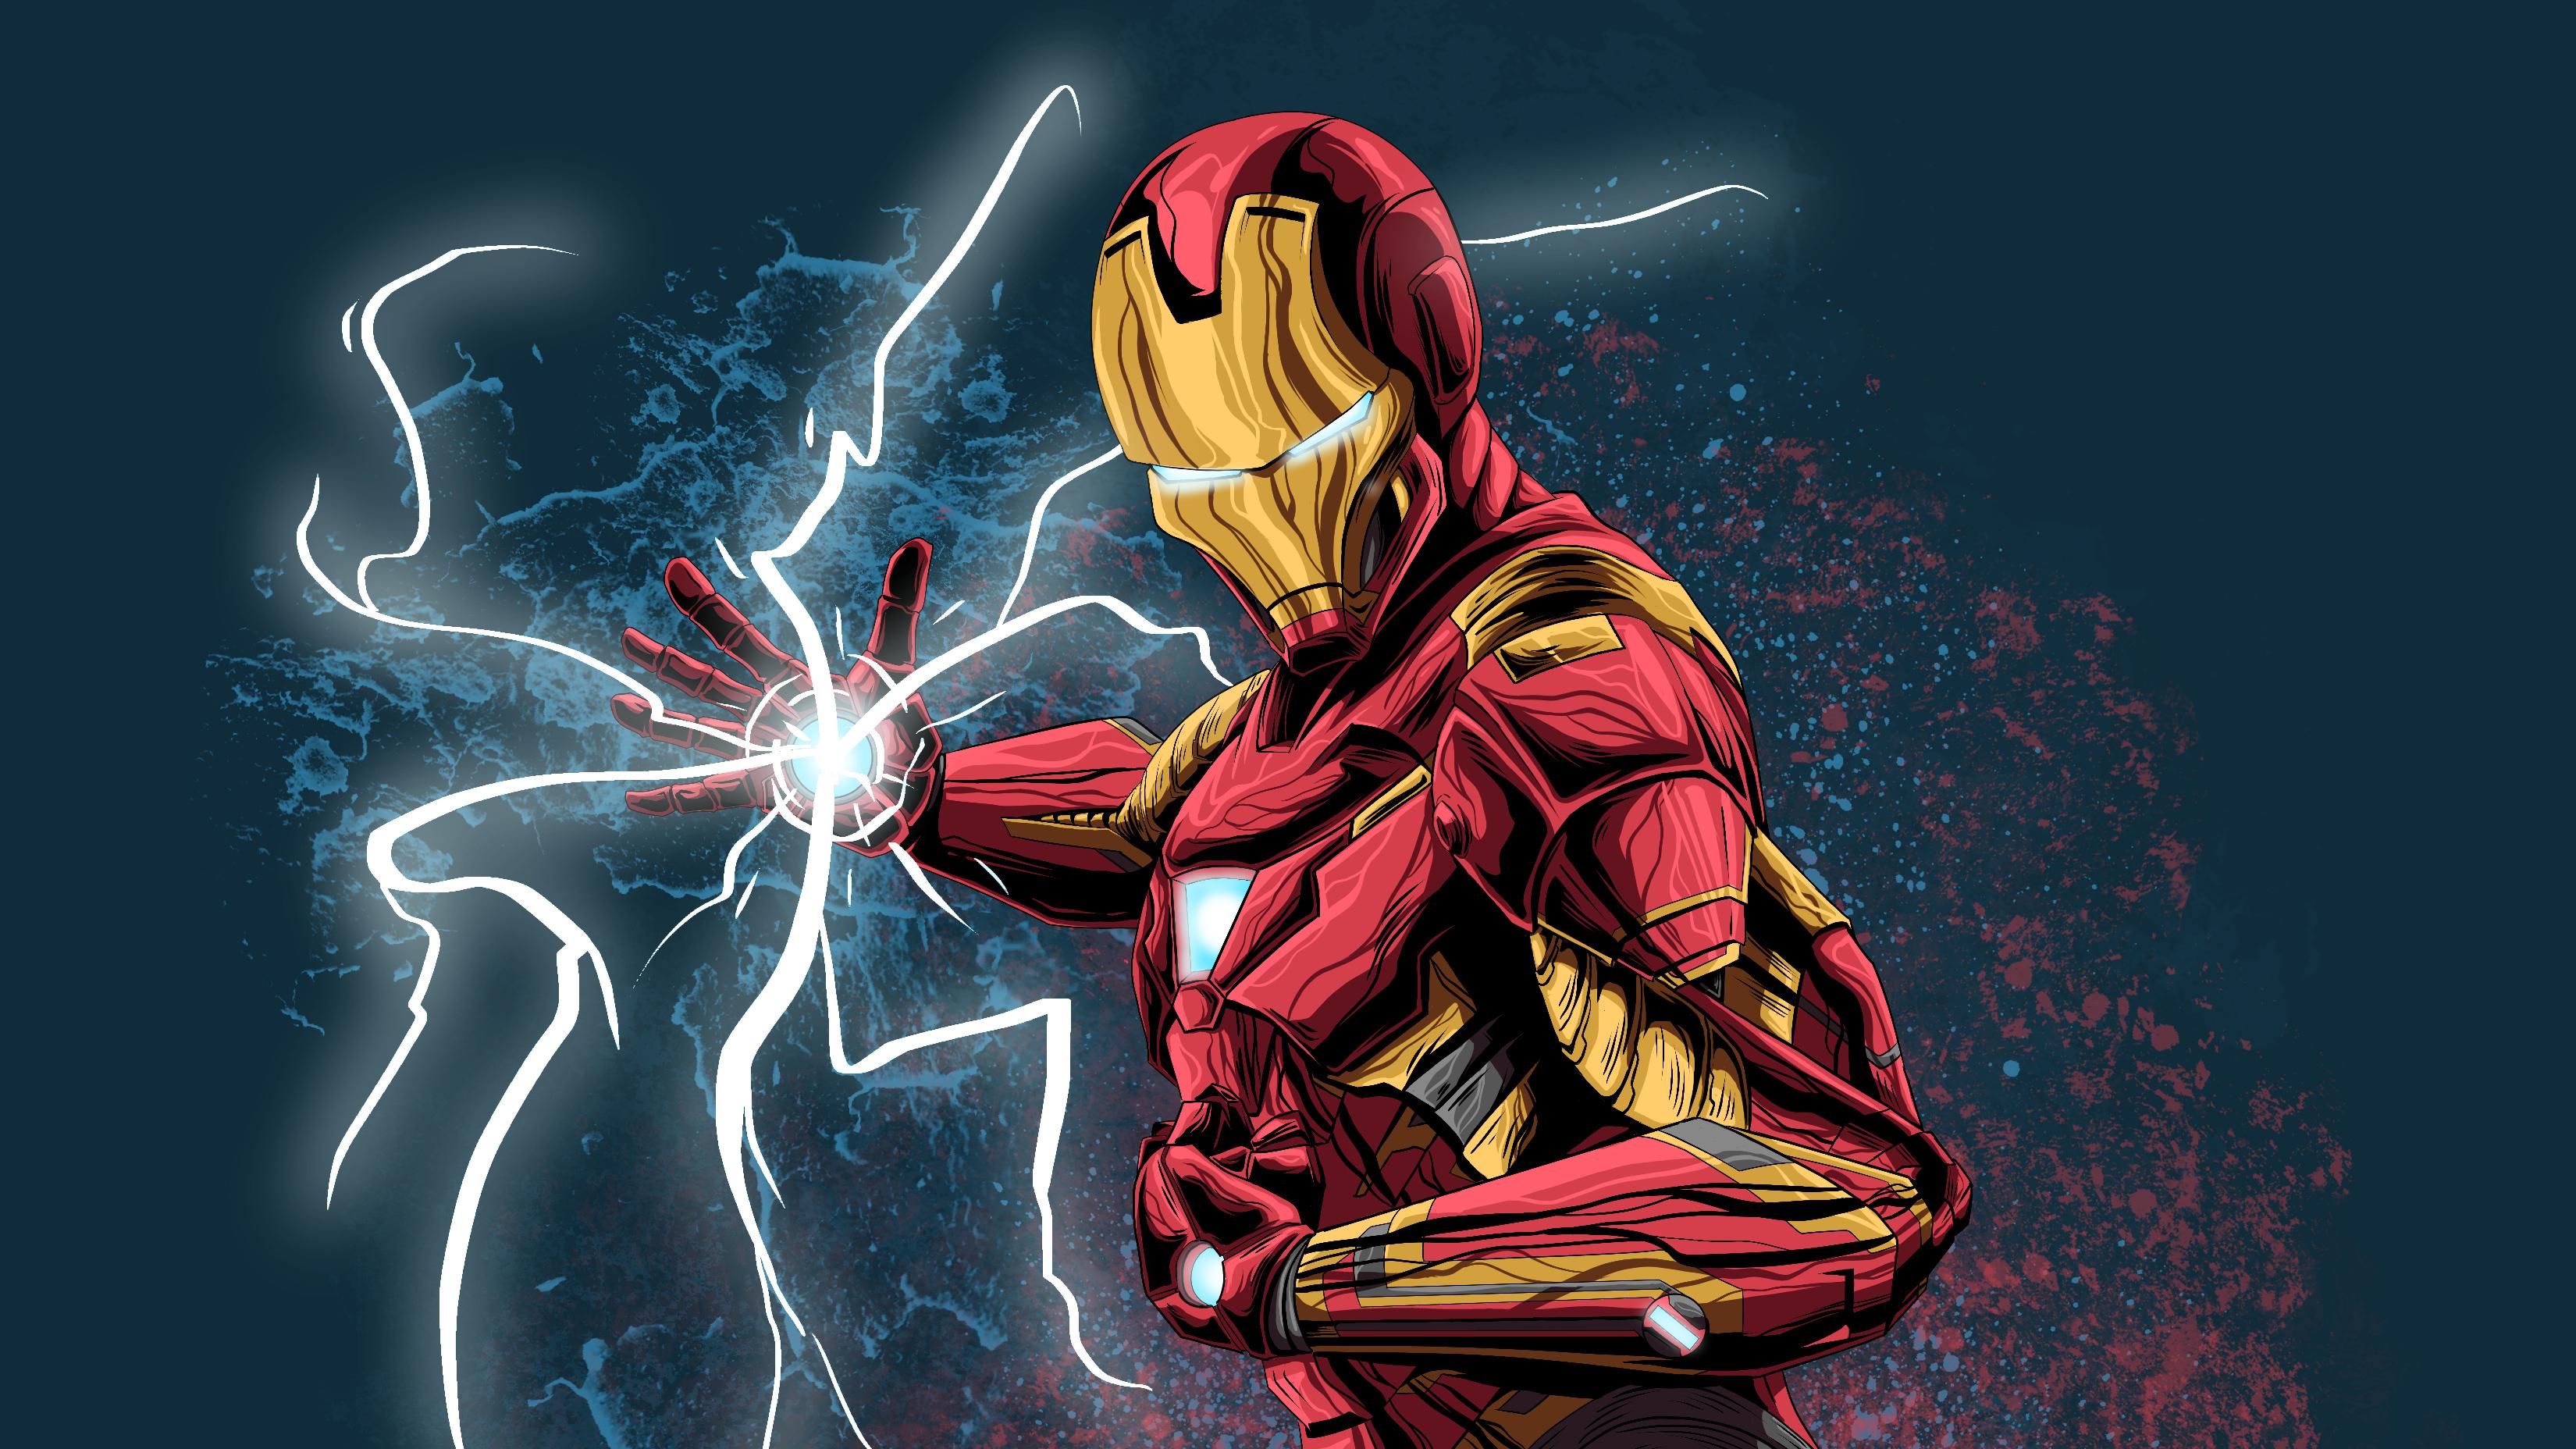 Fanart Of Iron Man 4k, HD Superheroes, 4k Wallpapers, Images